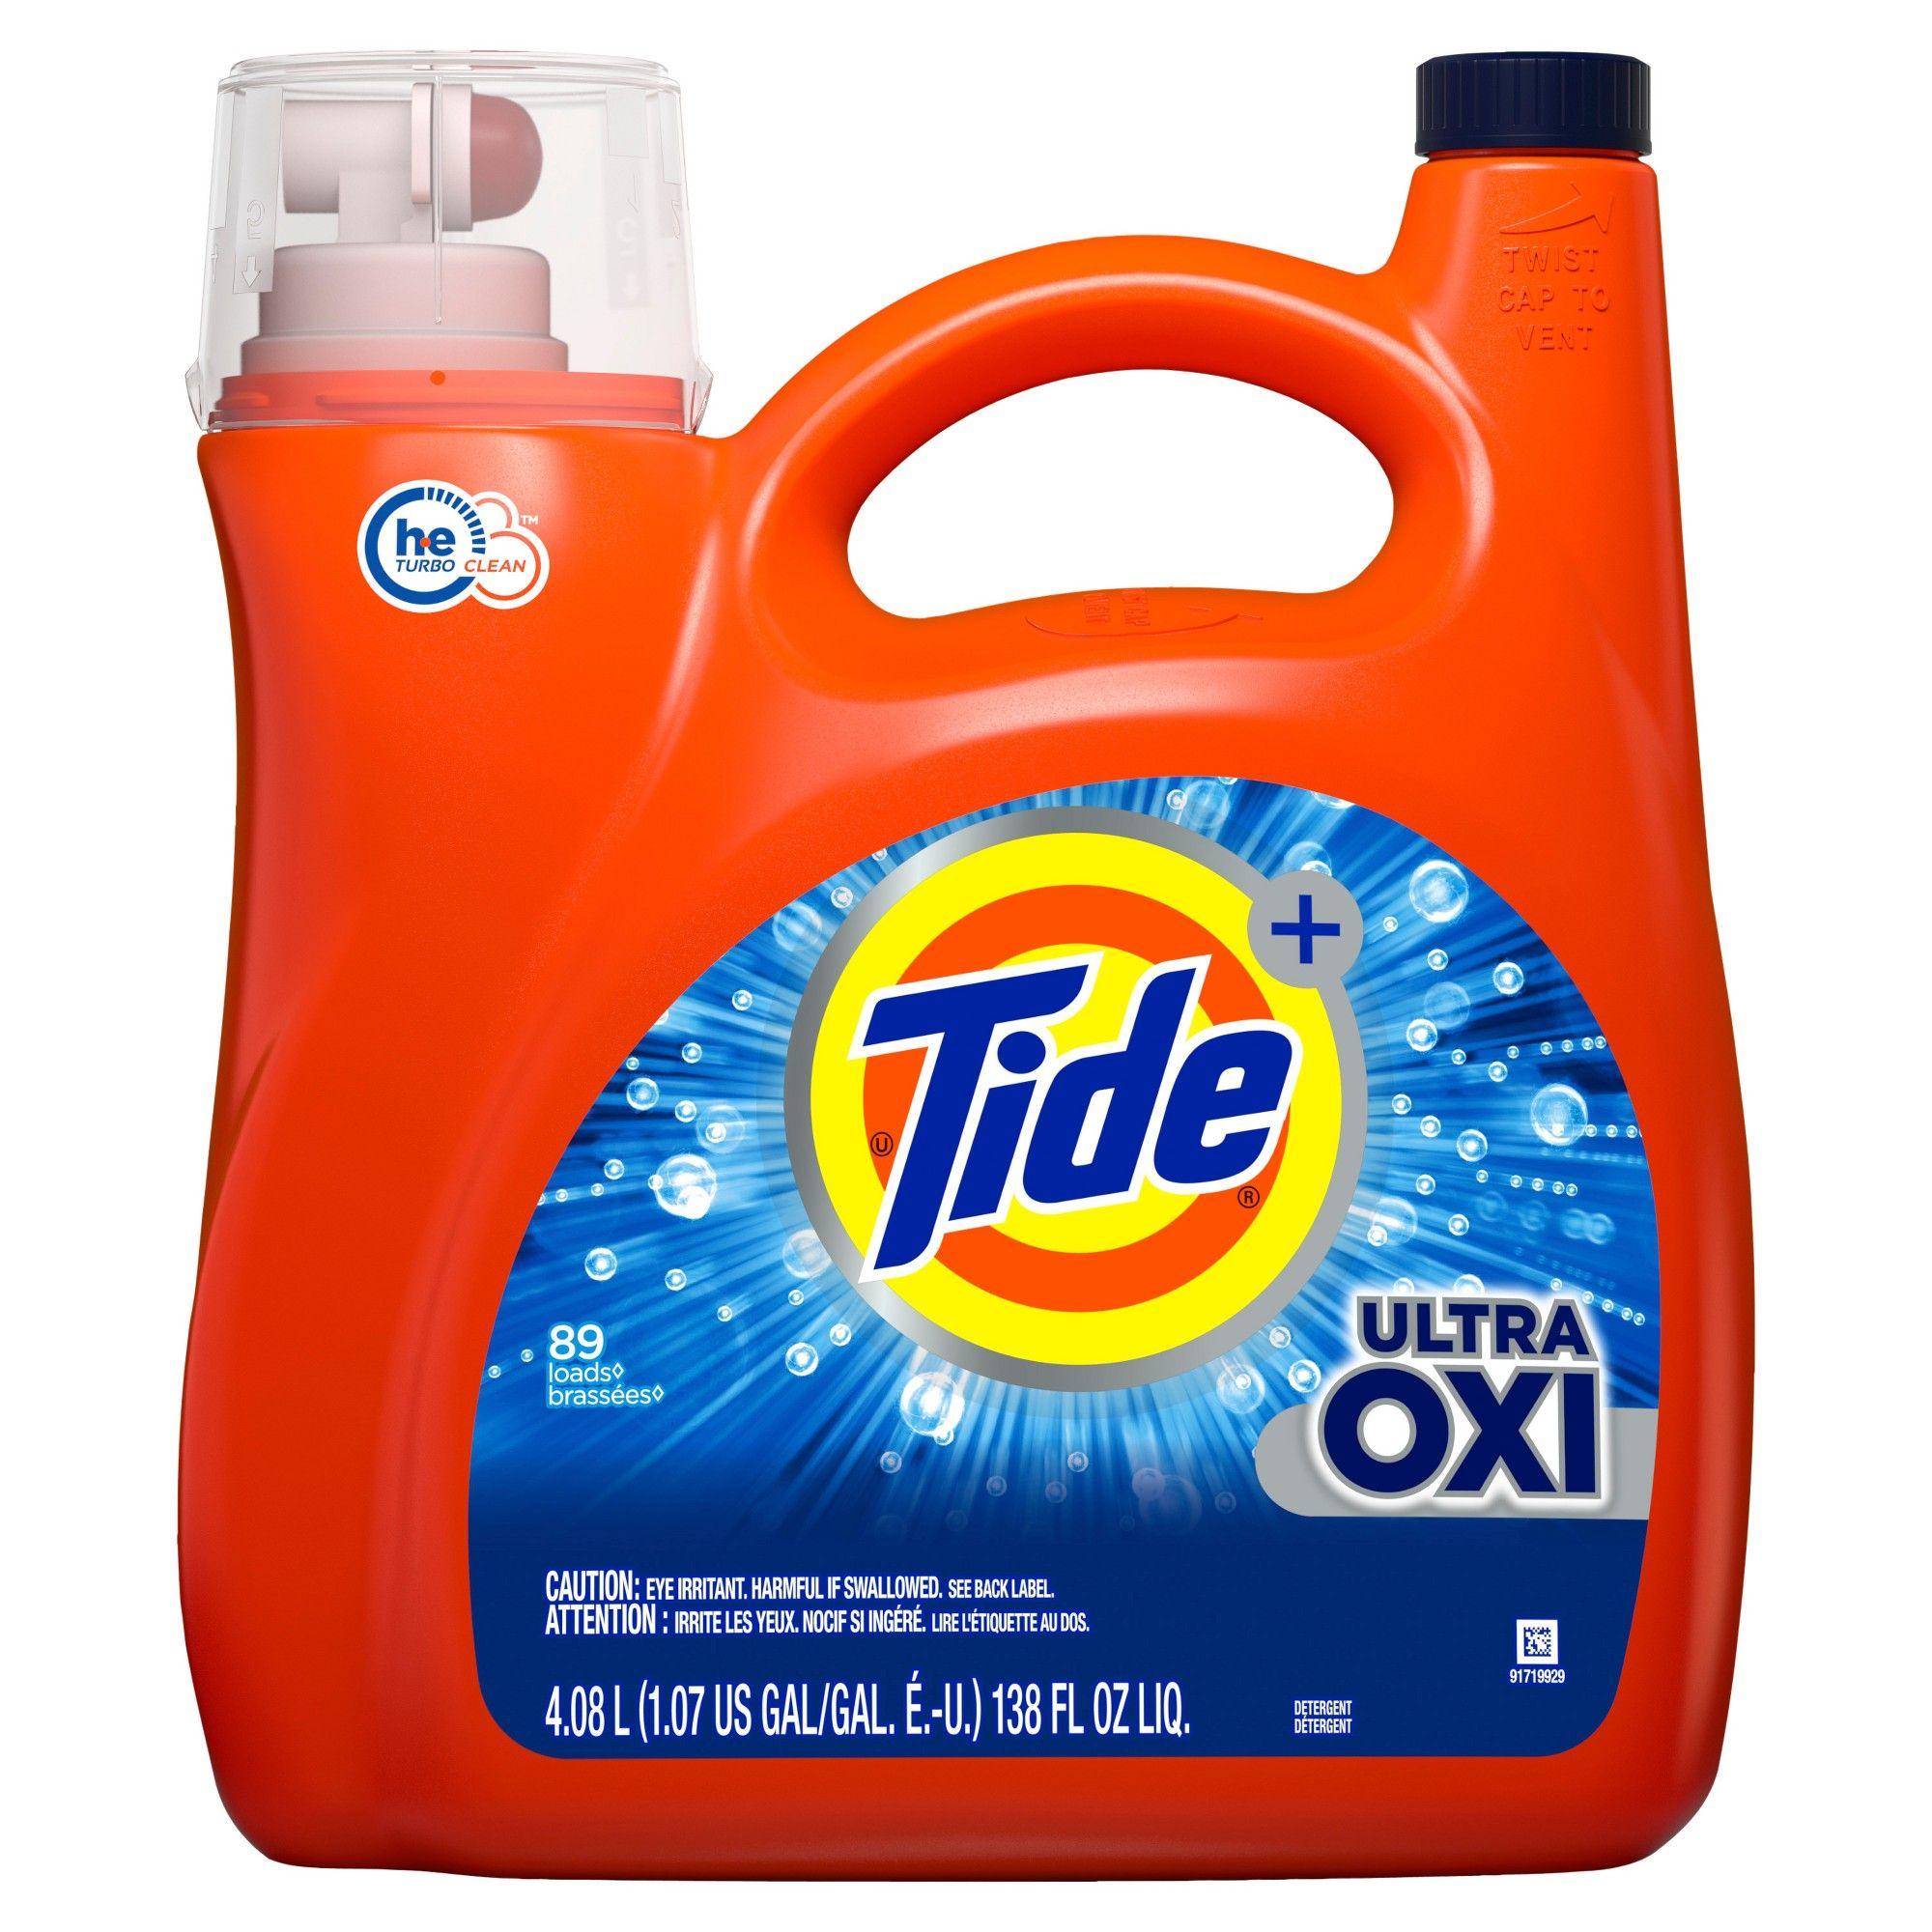 Tide Plus Ultra Oxi Liquid Laundry Detergent 138 Fl Oz Laundry